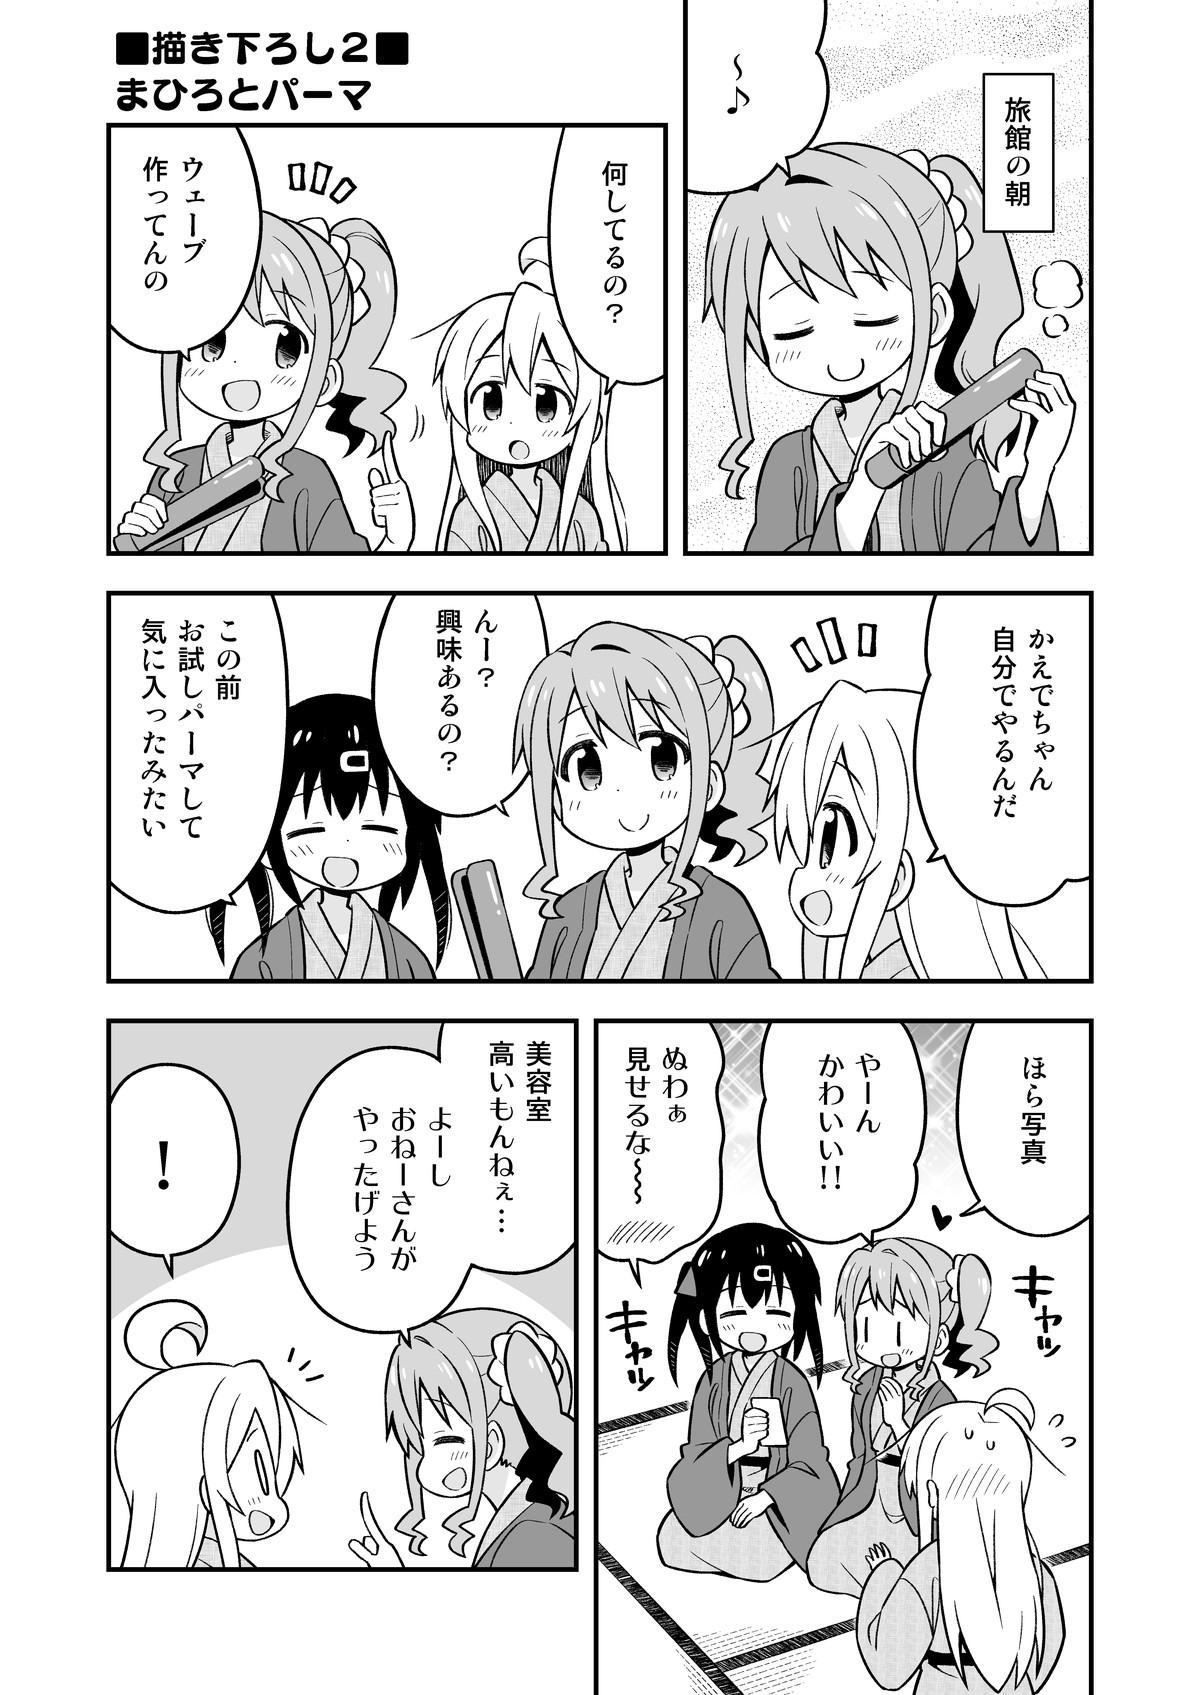 Onii-chan wa Oshimai! 6 45